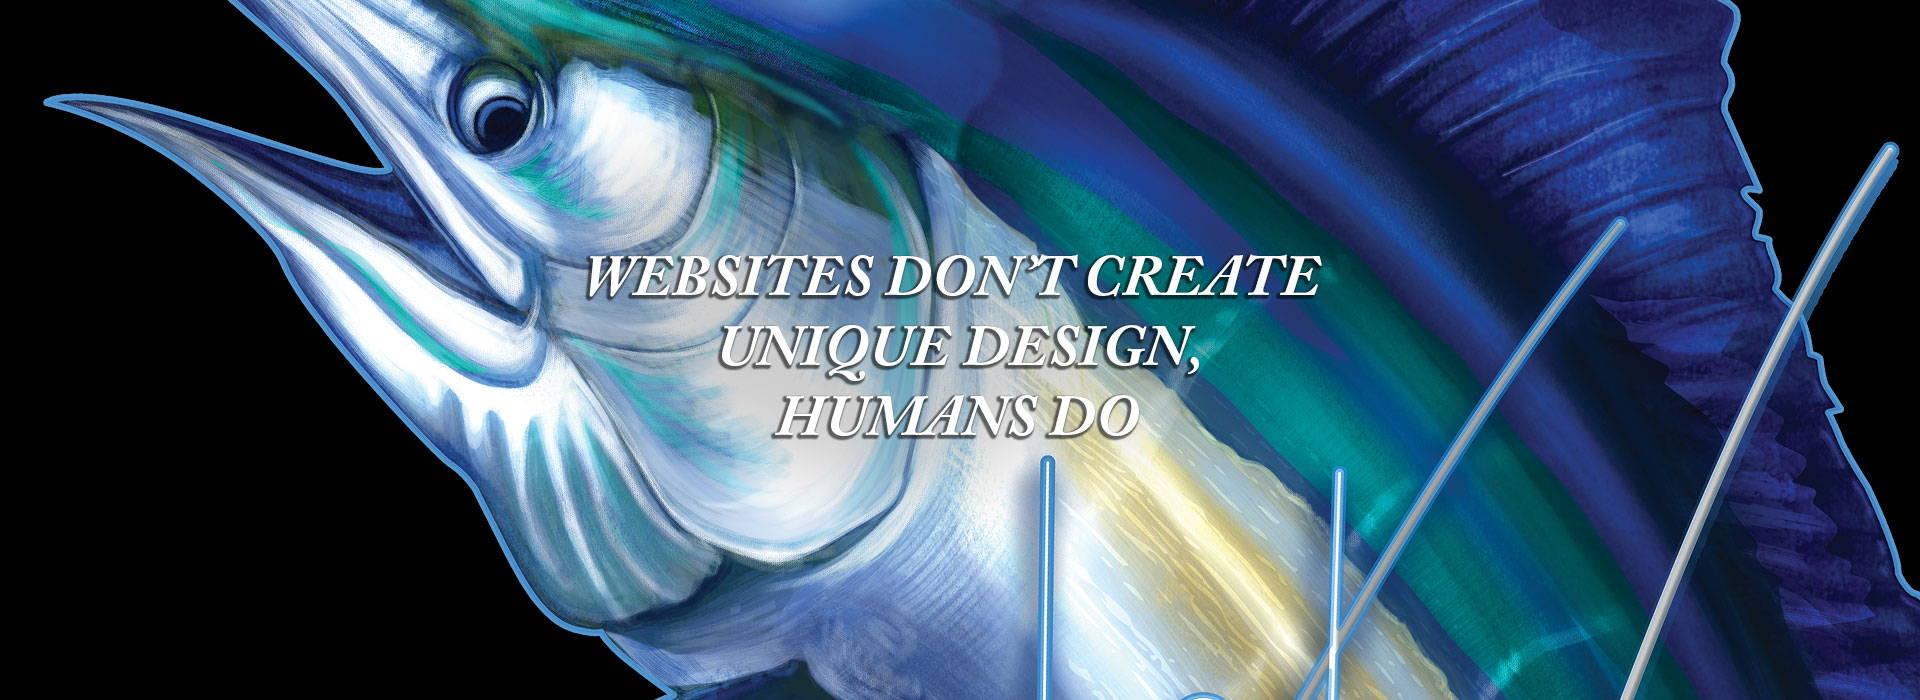 websites dont create unique design but humans do quote by briny